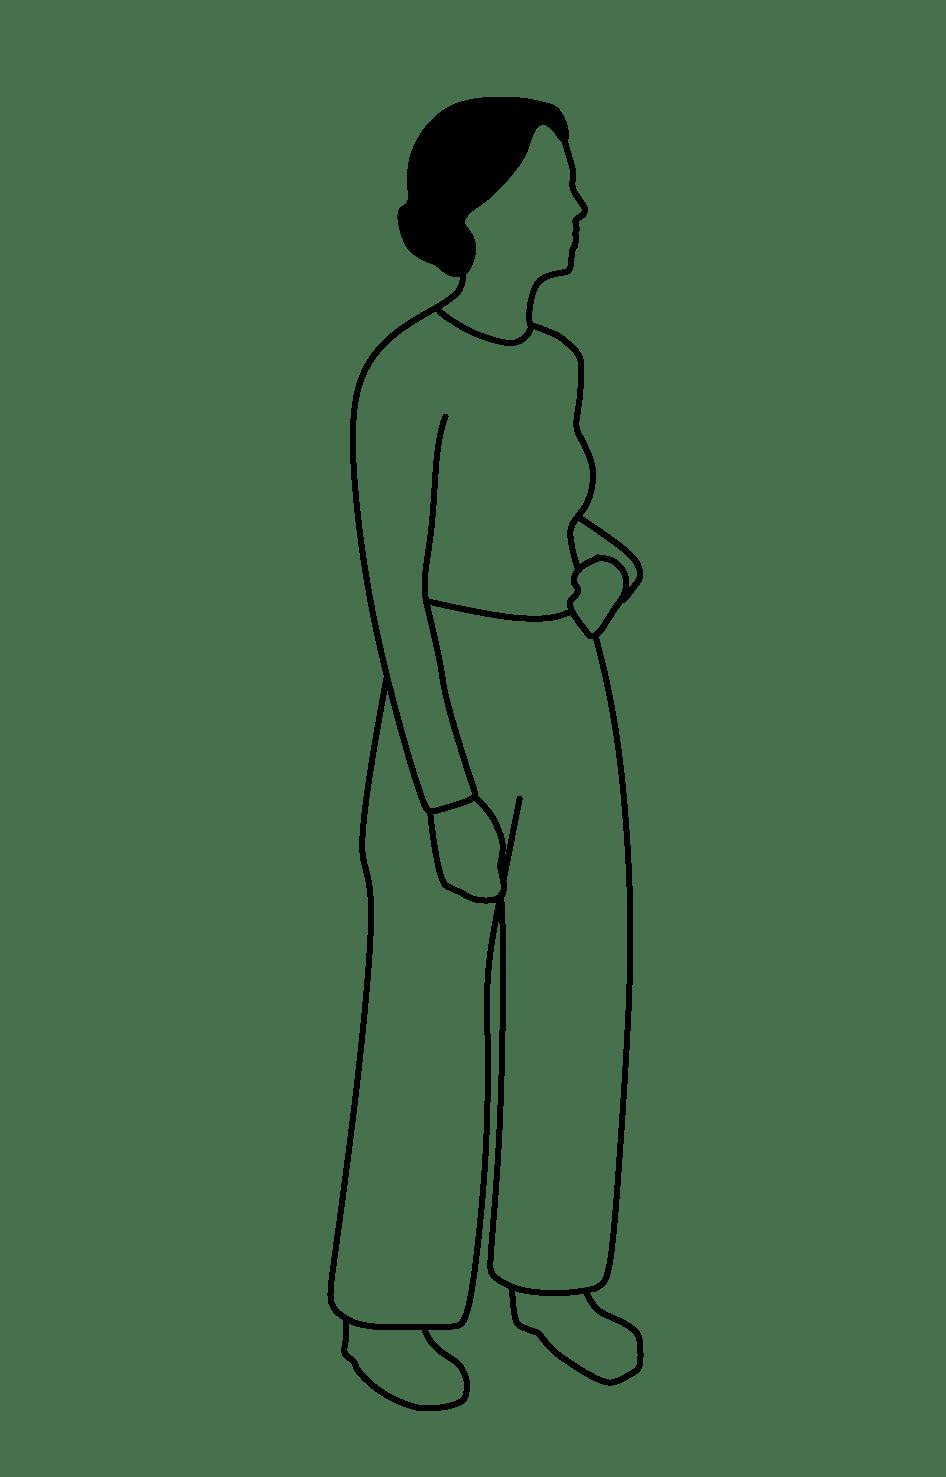 210910_outline wohnlabor_final-02